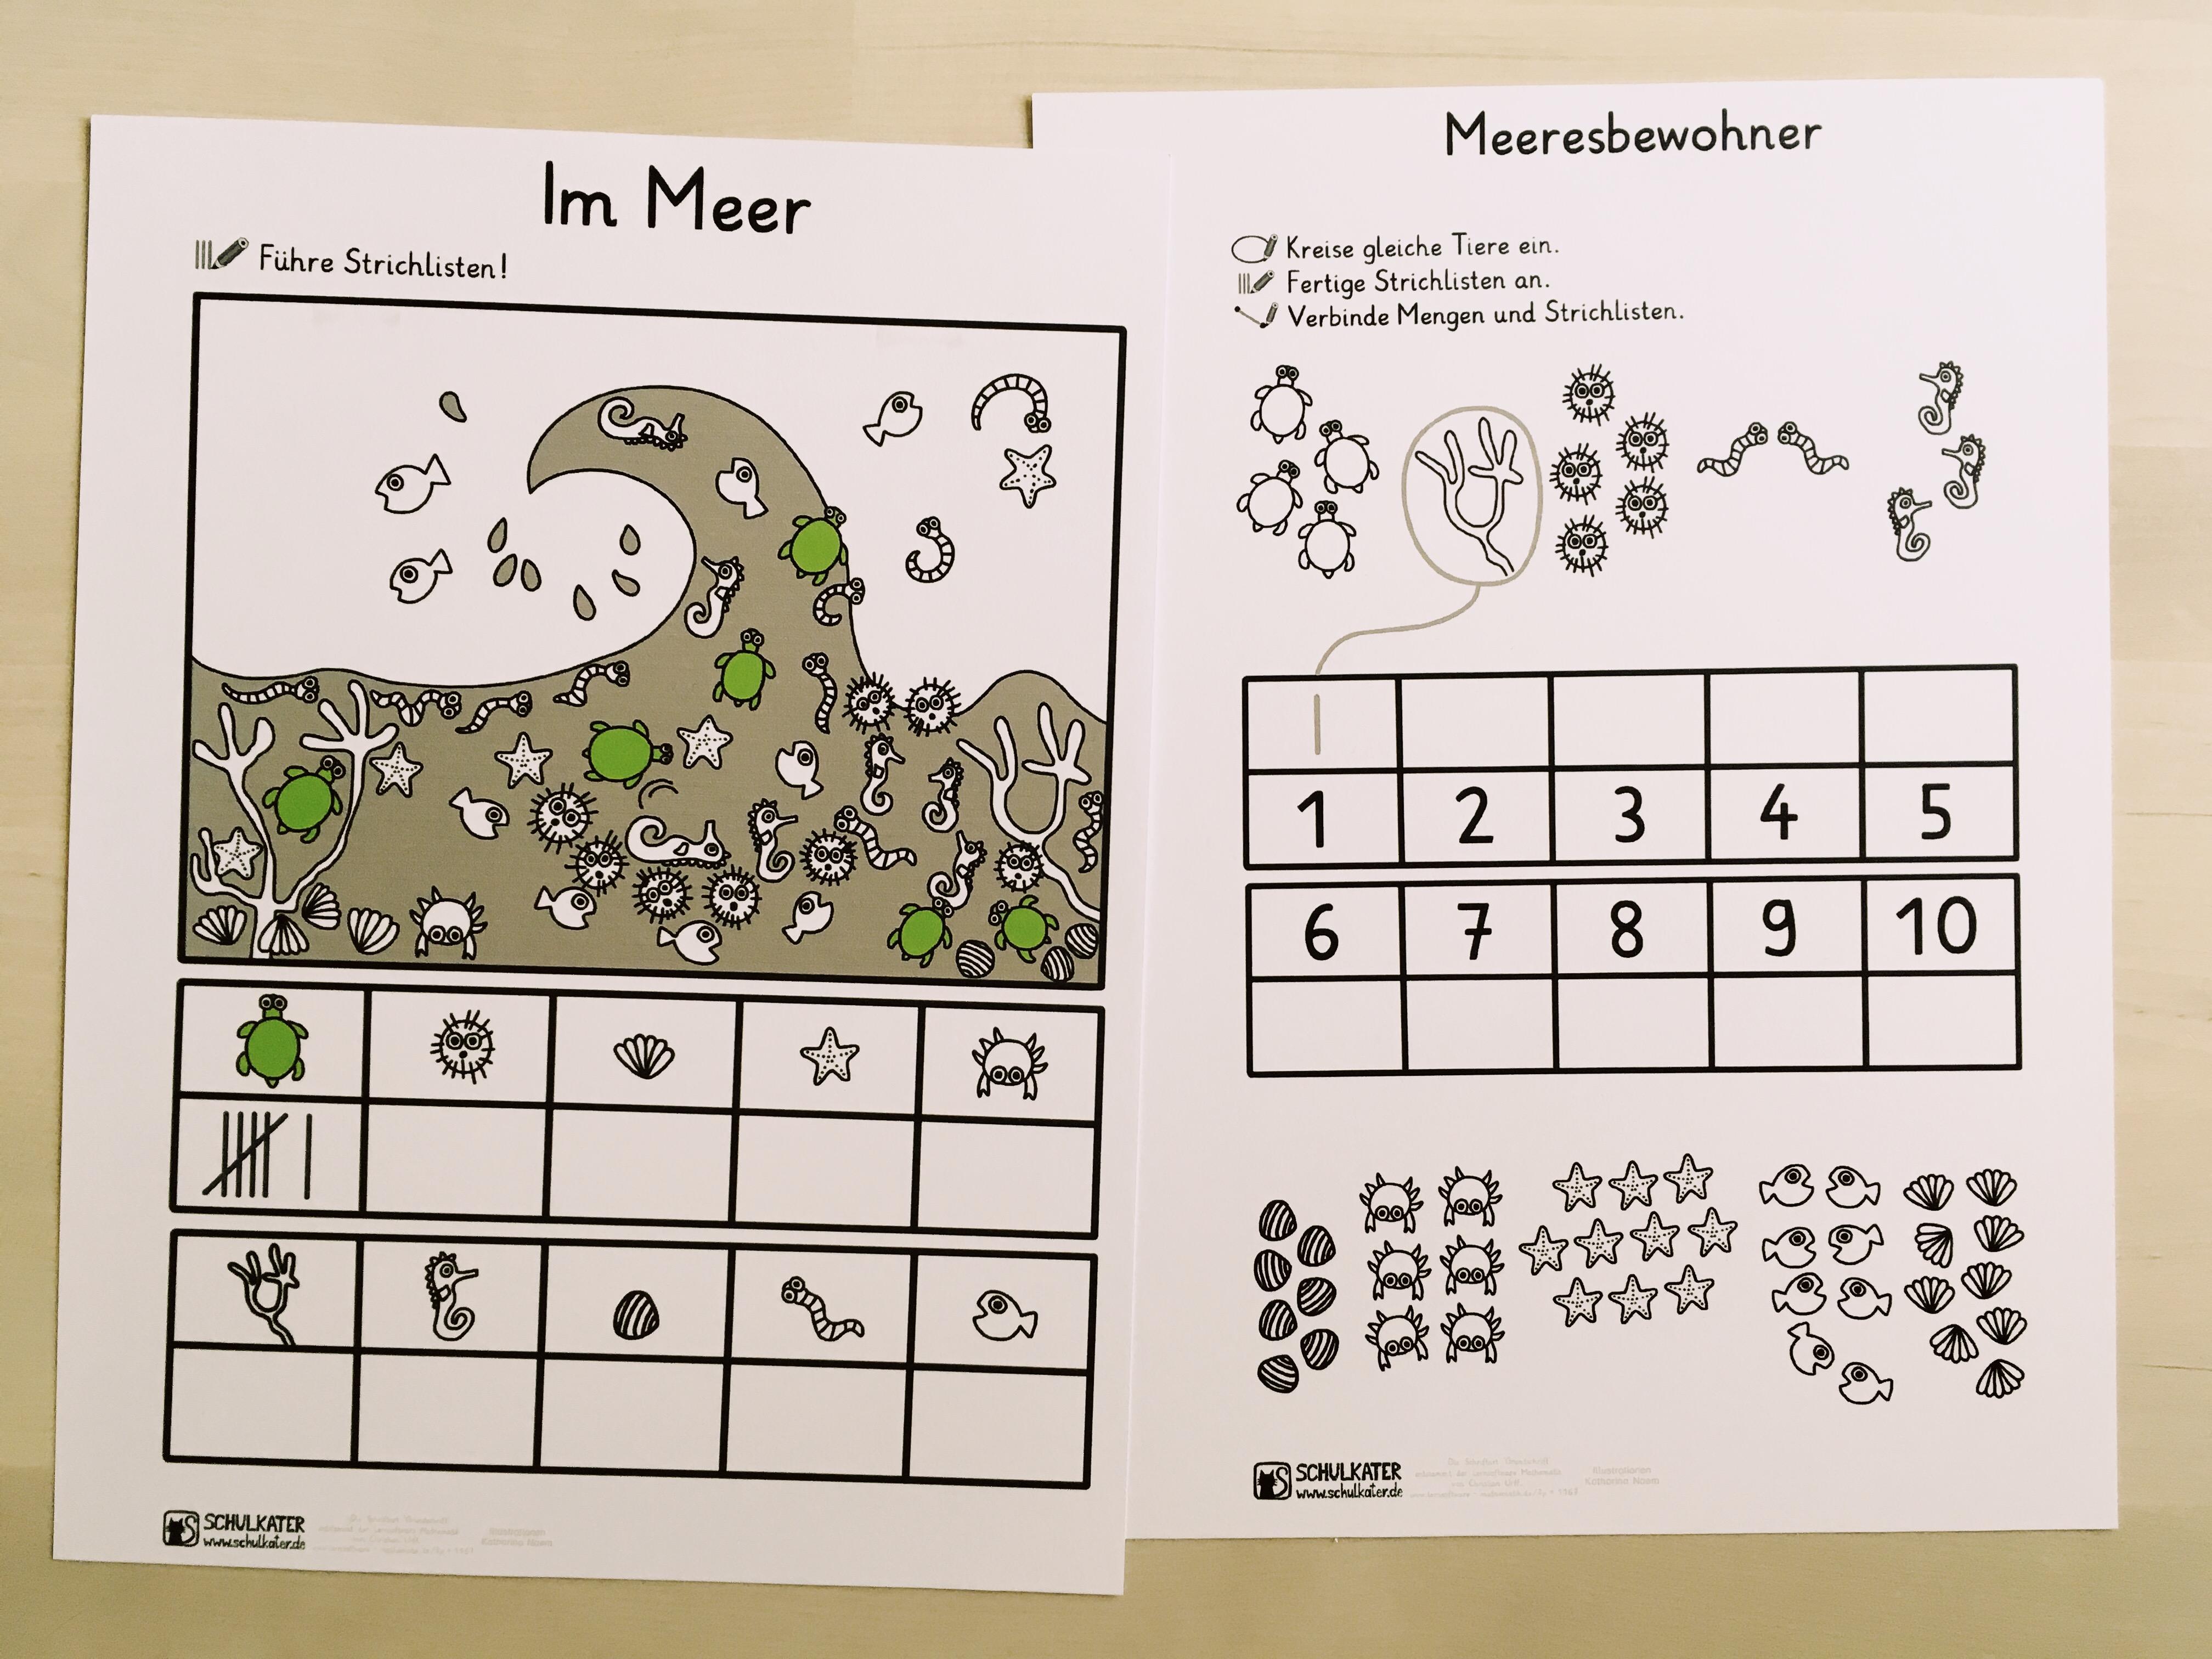 Fantastisch Math Zehn Rahmen Arbeitsblatt Ideen - Gemischte Übungen ...